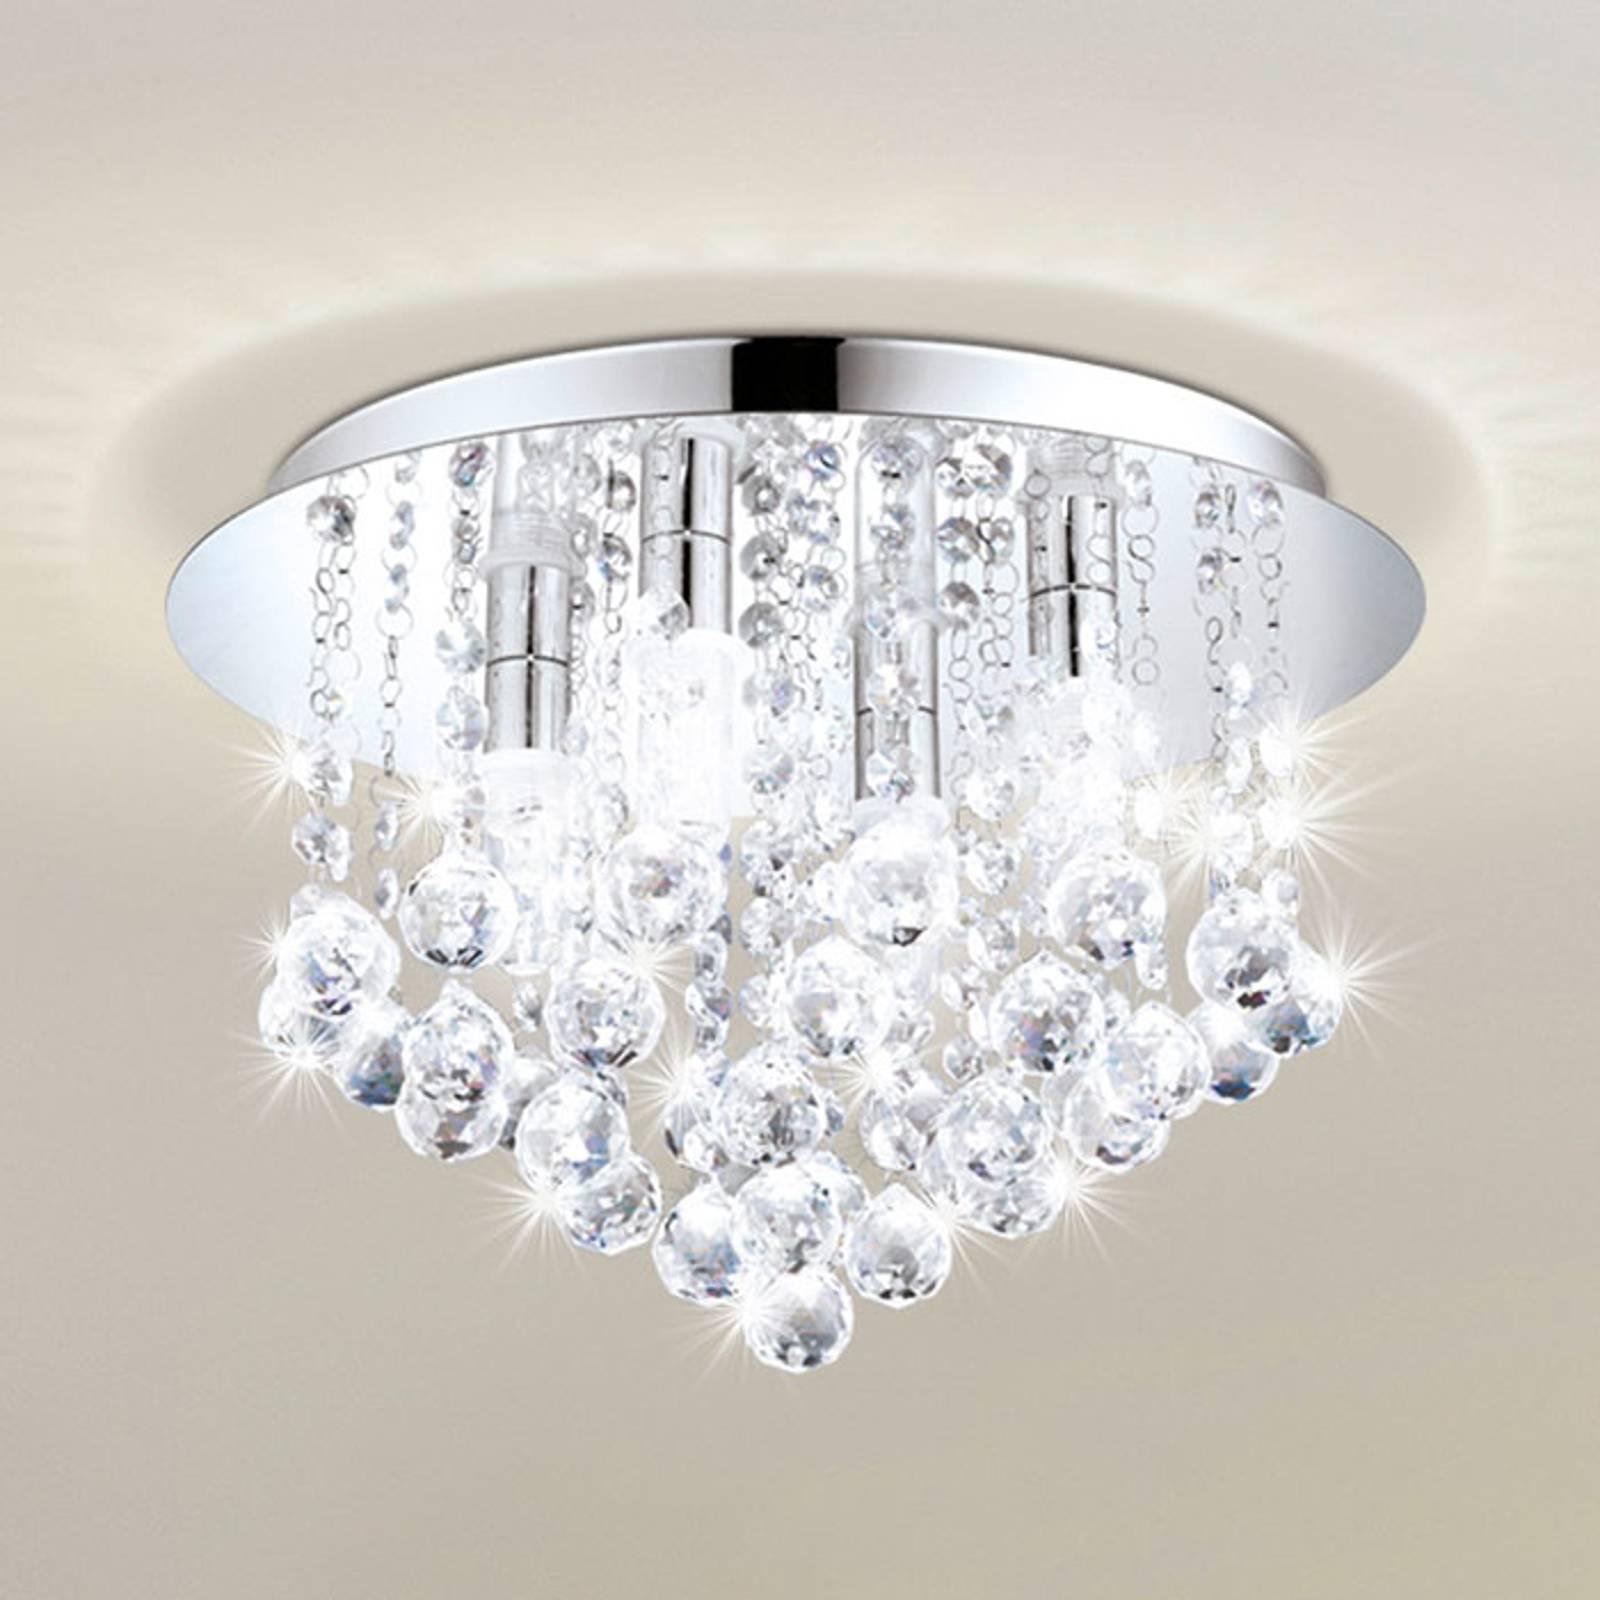 LED-kattovalaisin Almonte koristein, 35 cm